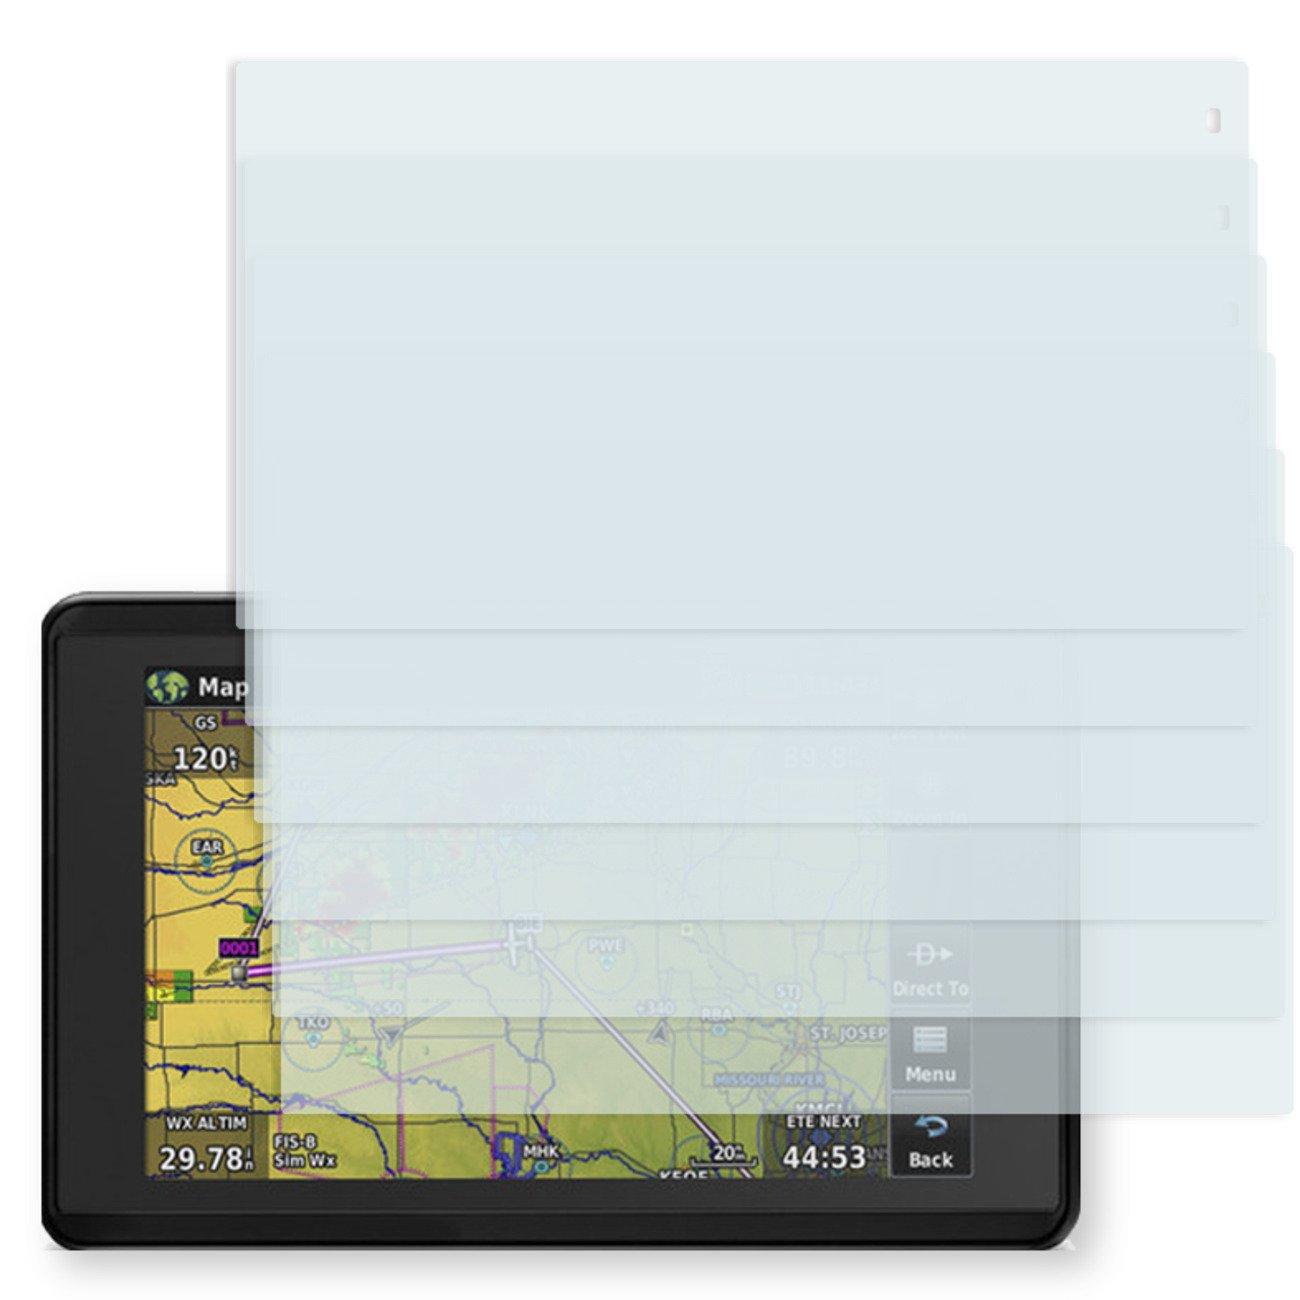 6X Golebo Anti-Glare Screen Protector for Garmin aera 660 (Anti-Reflex, Air Pocket Free Application, Easy to Remove)